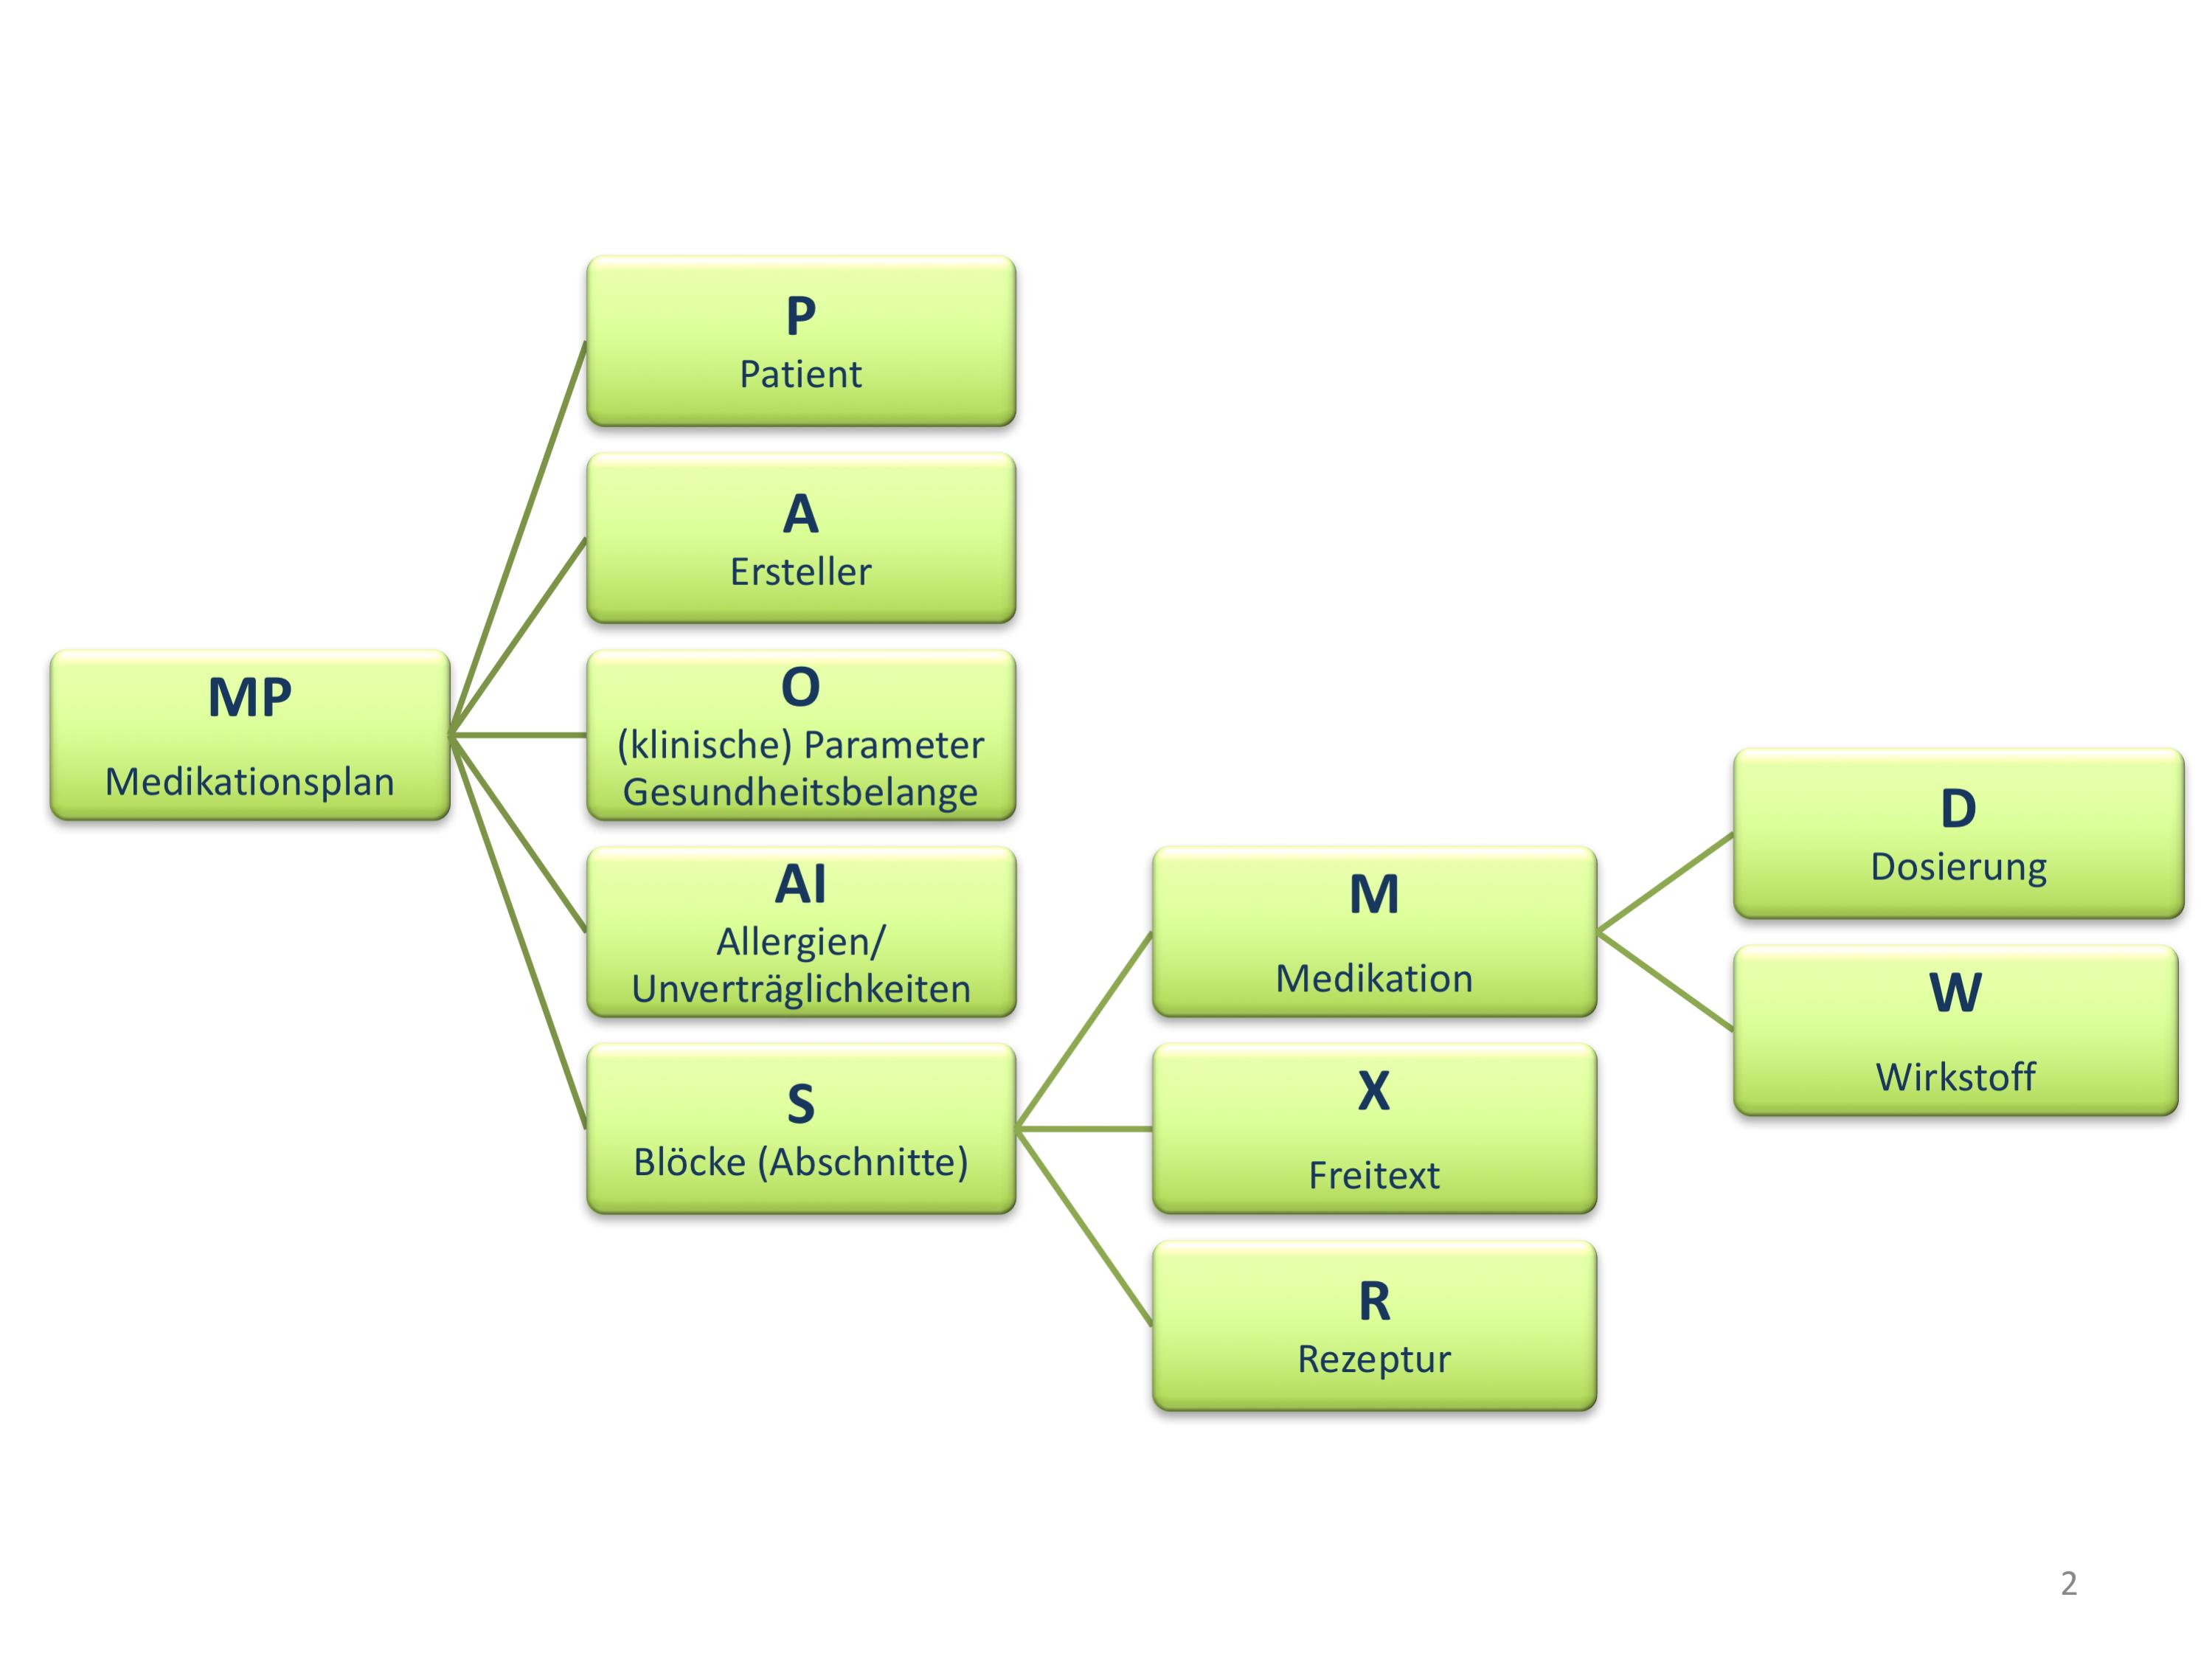 cdamedp:Ultrakurzformat plus – Hl7wiki